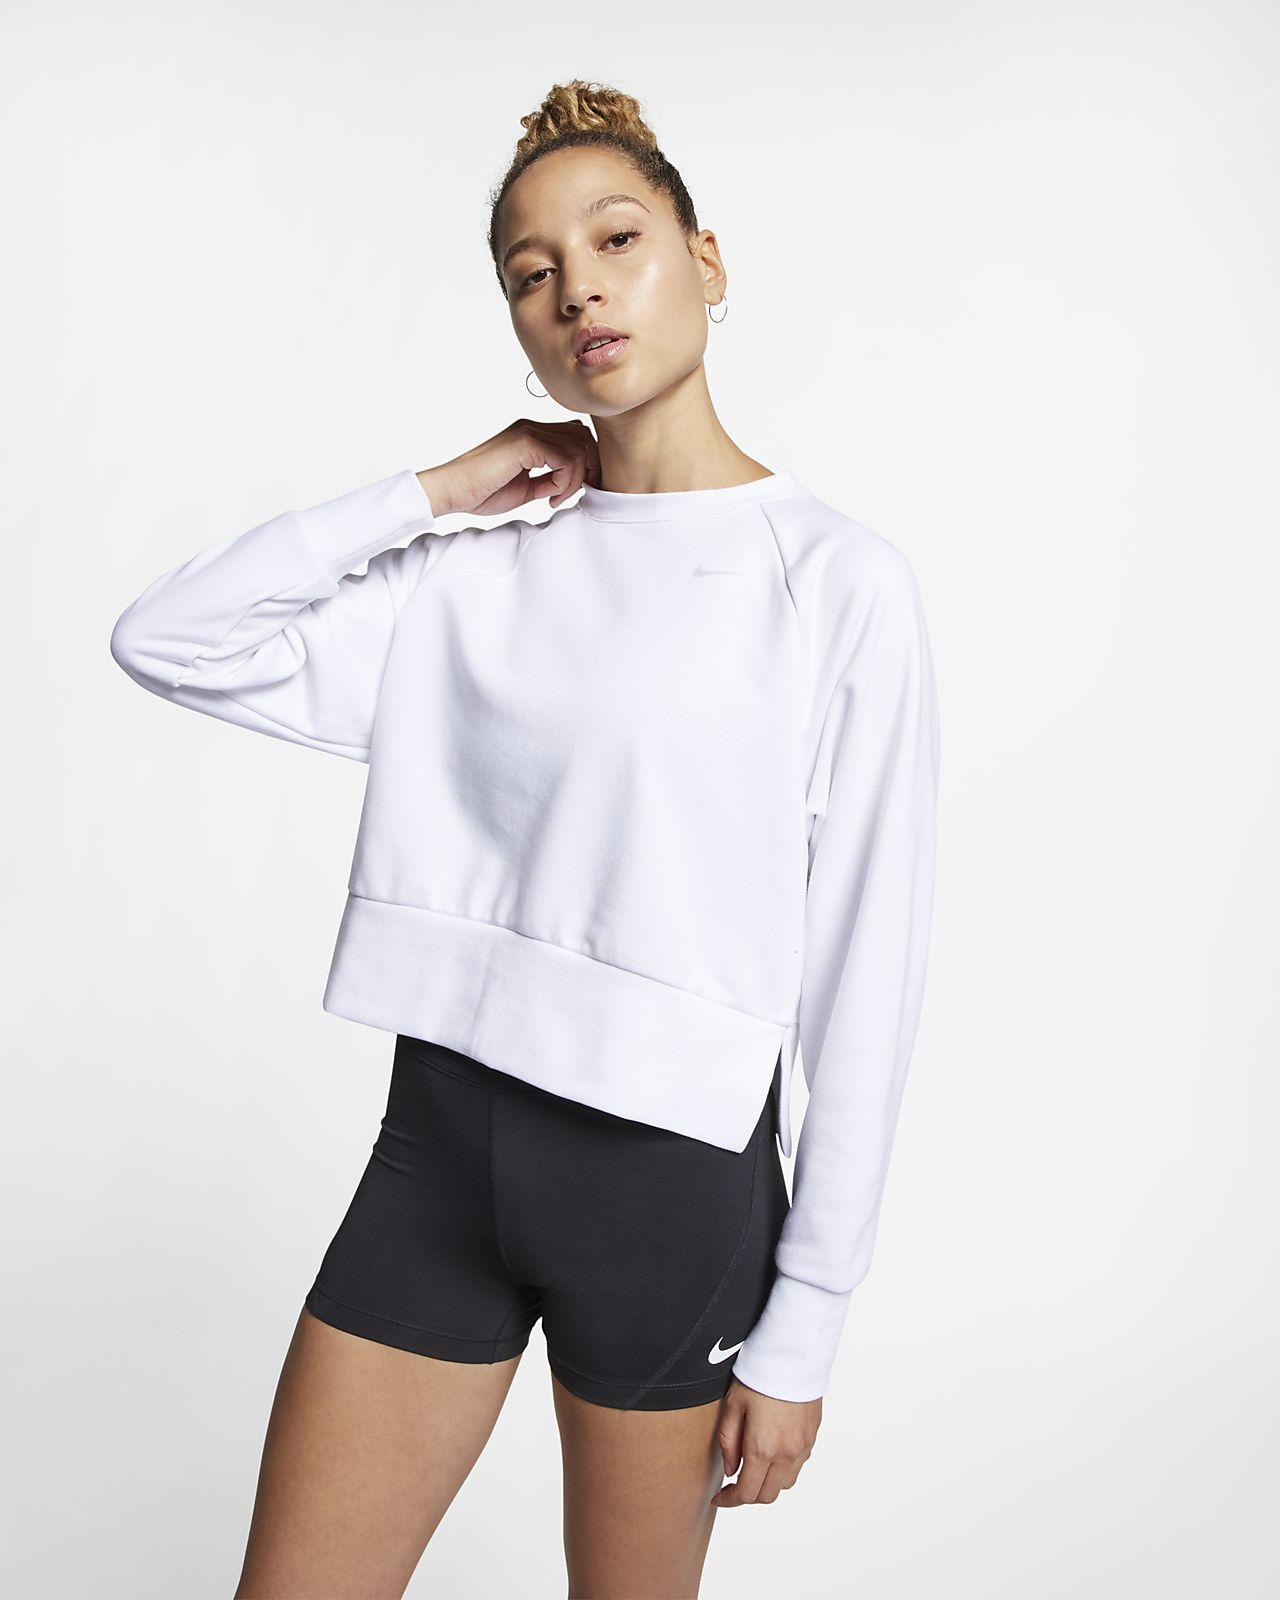 Nike Dri-FIT 女款長袖瑜伽訓練上衣